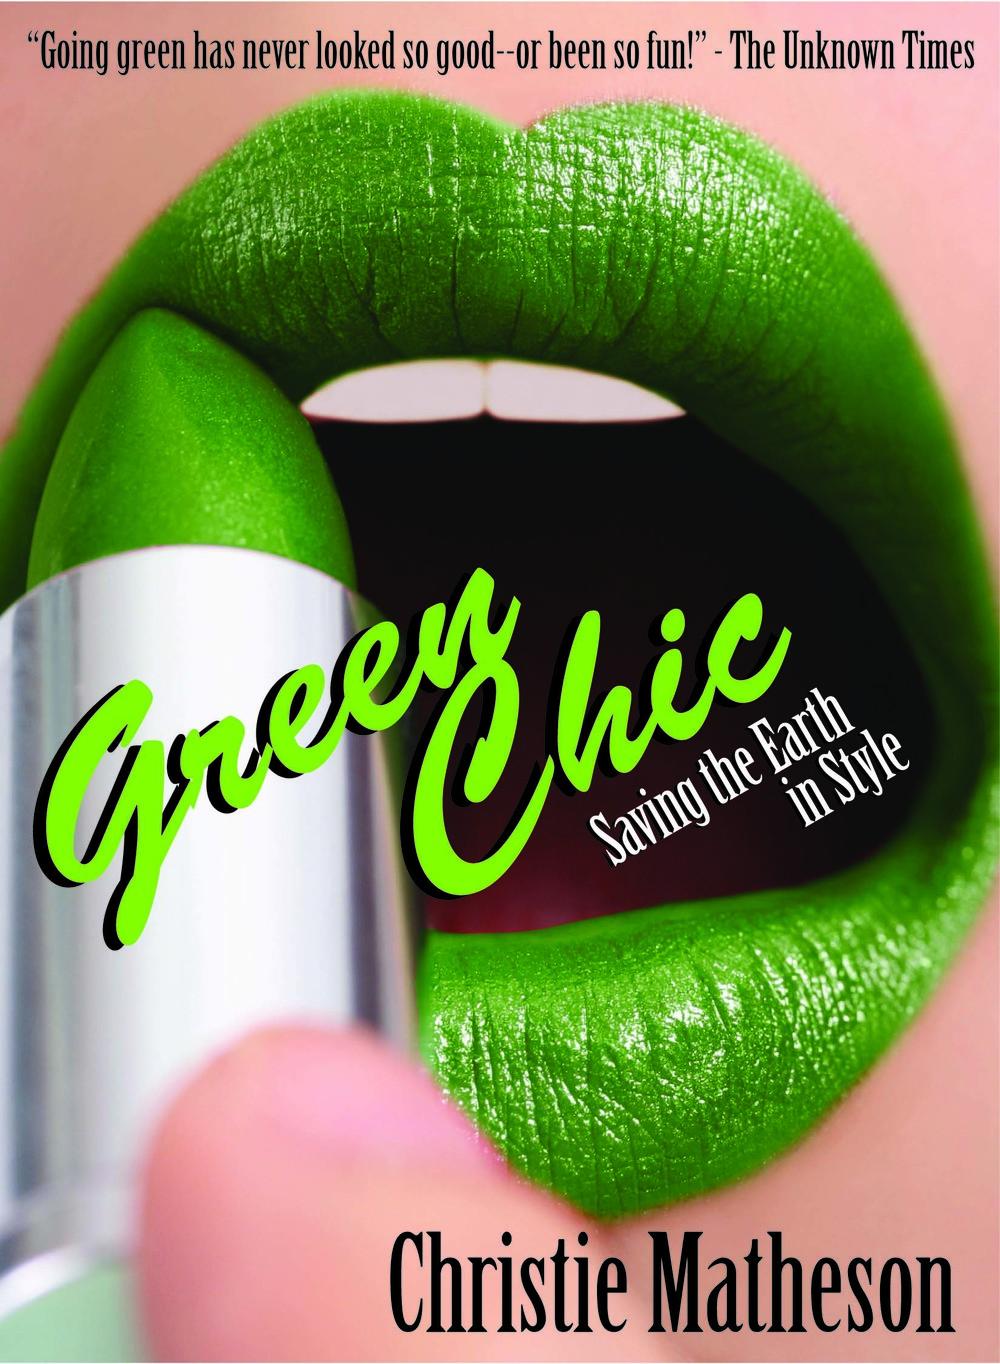 Green_Chic_Concept_1.jpg